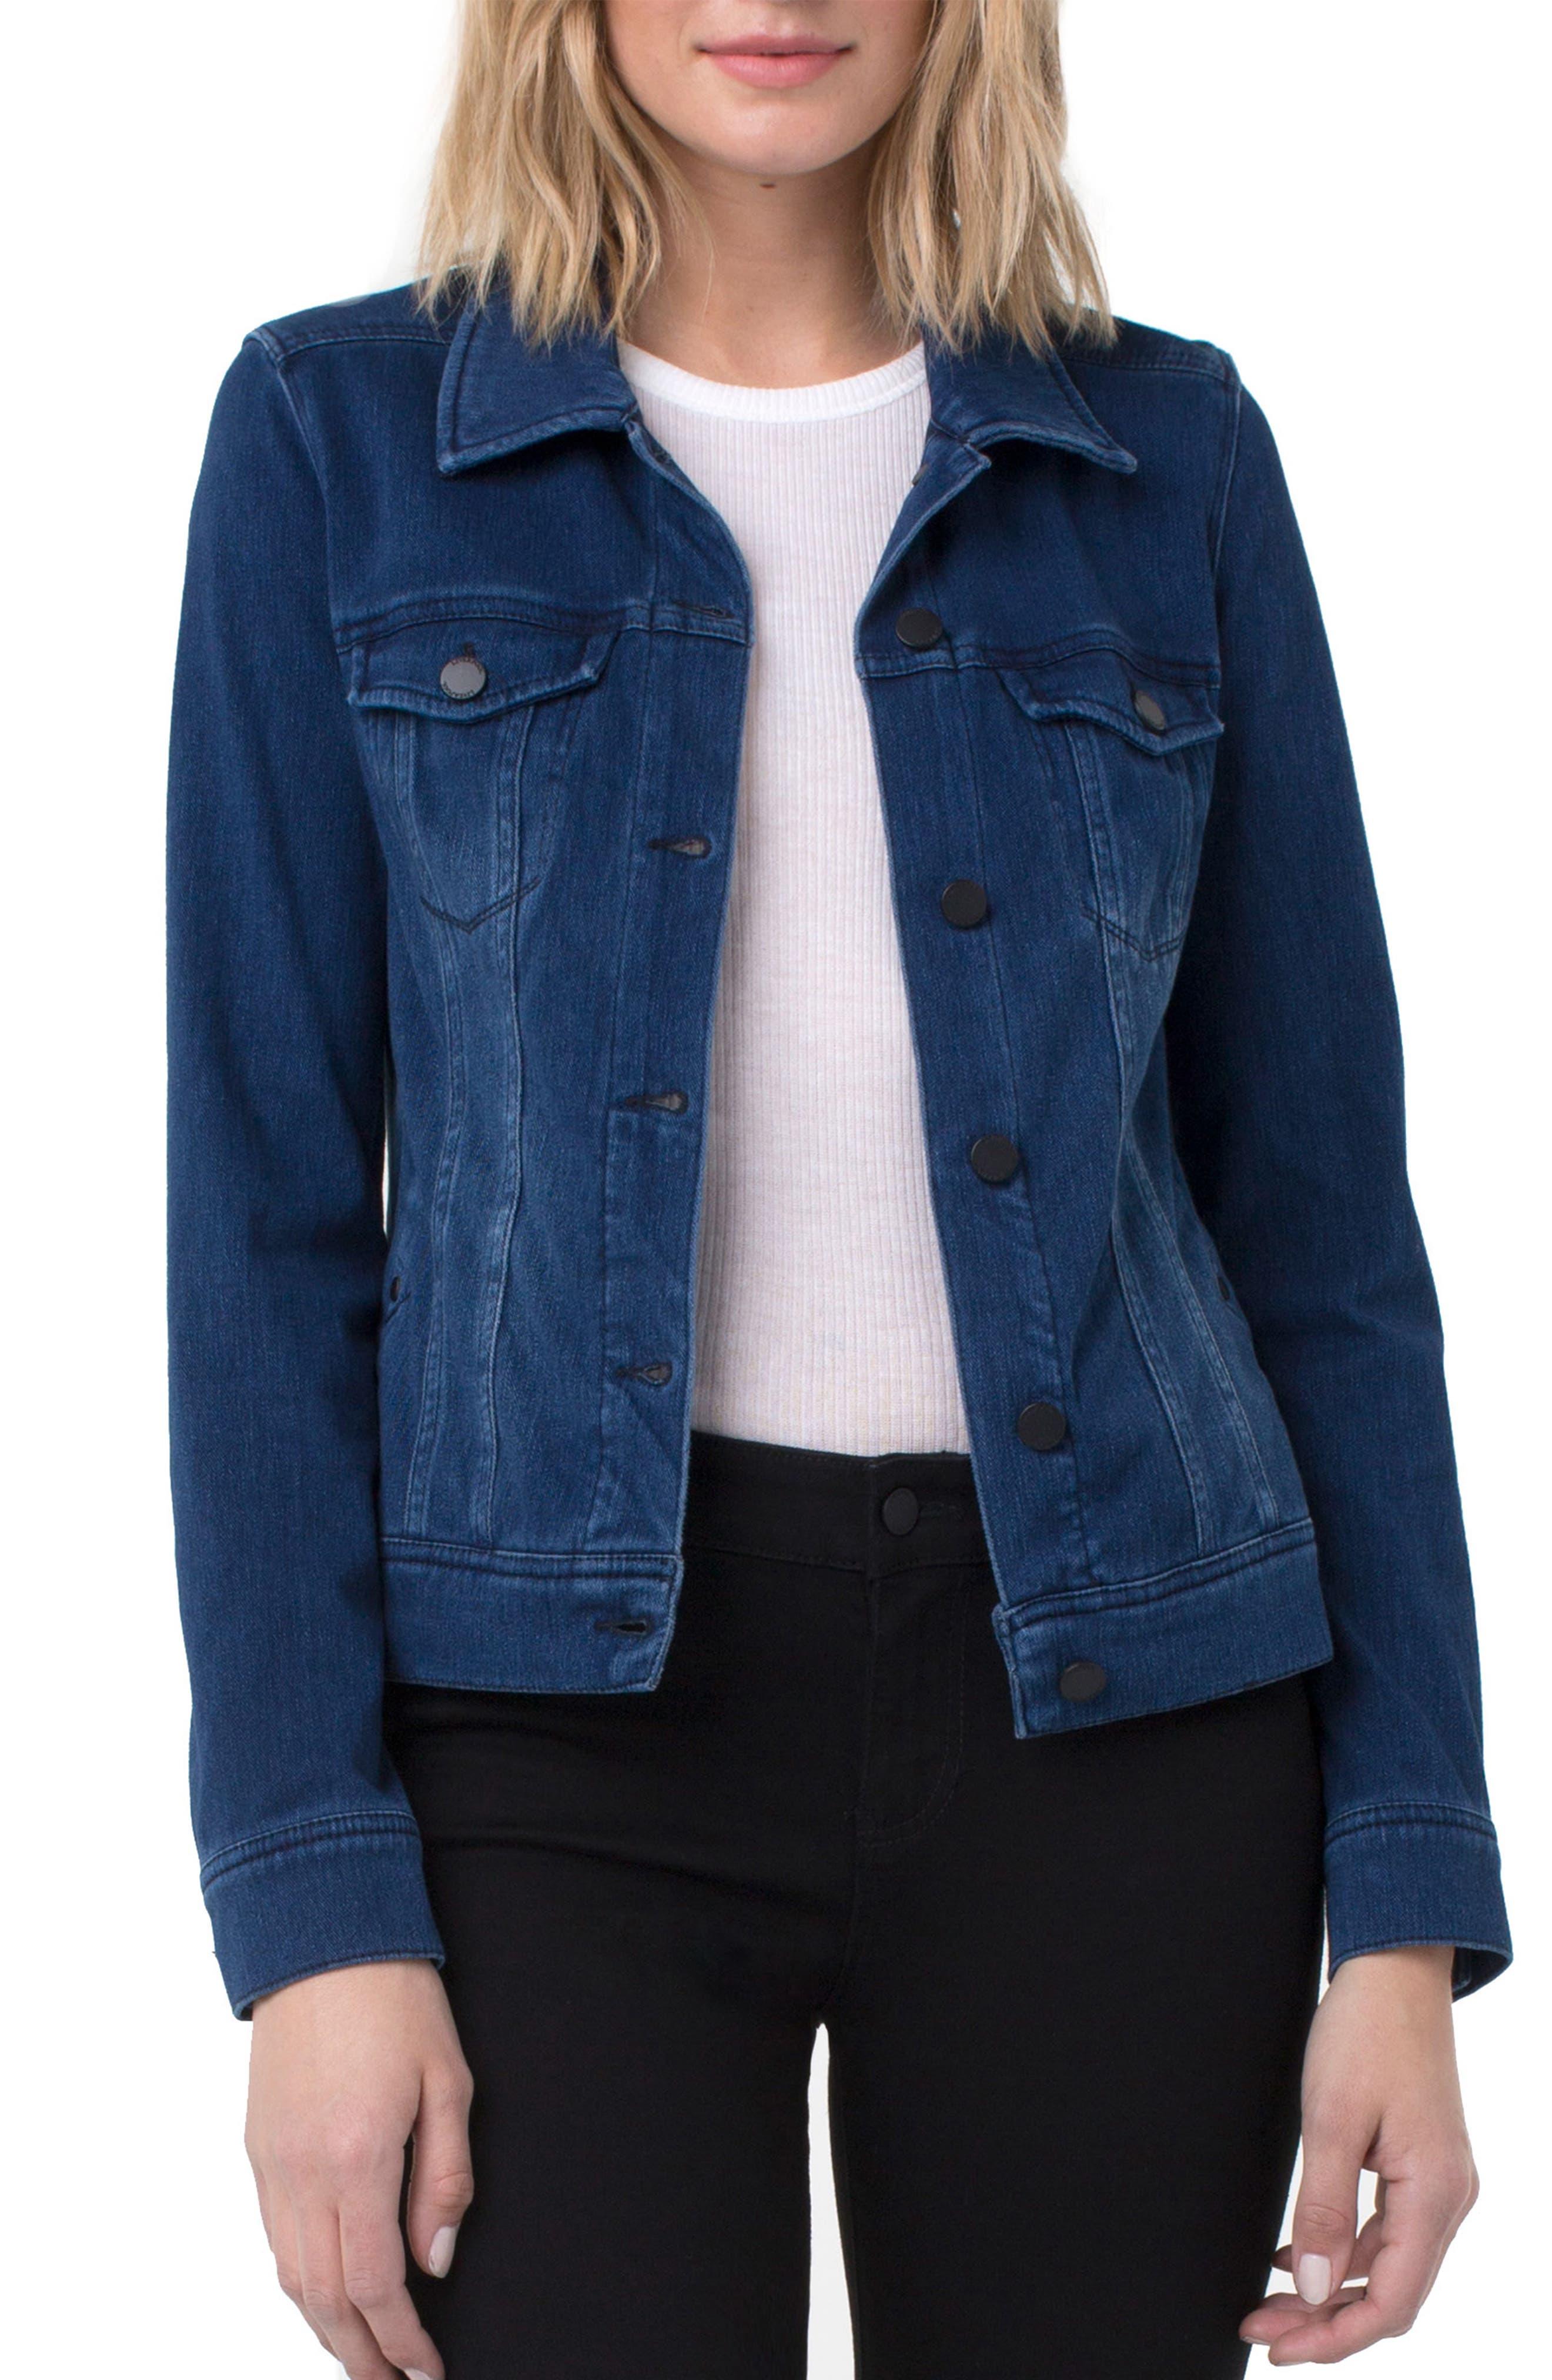 Jeans Company Knit Denim Jacket